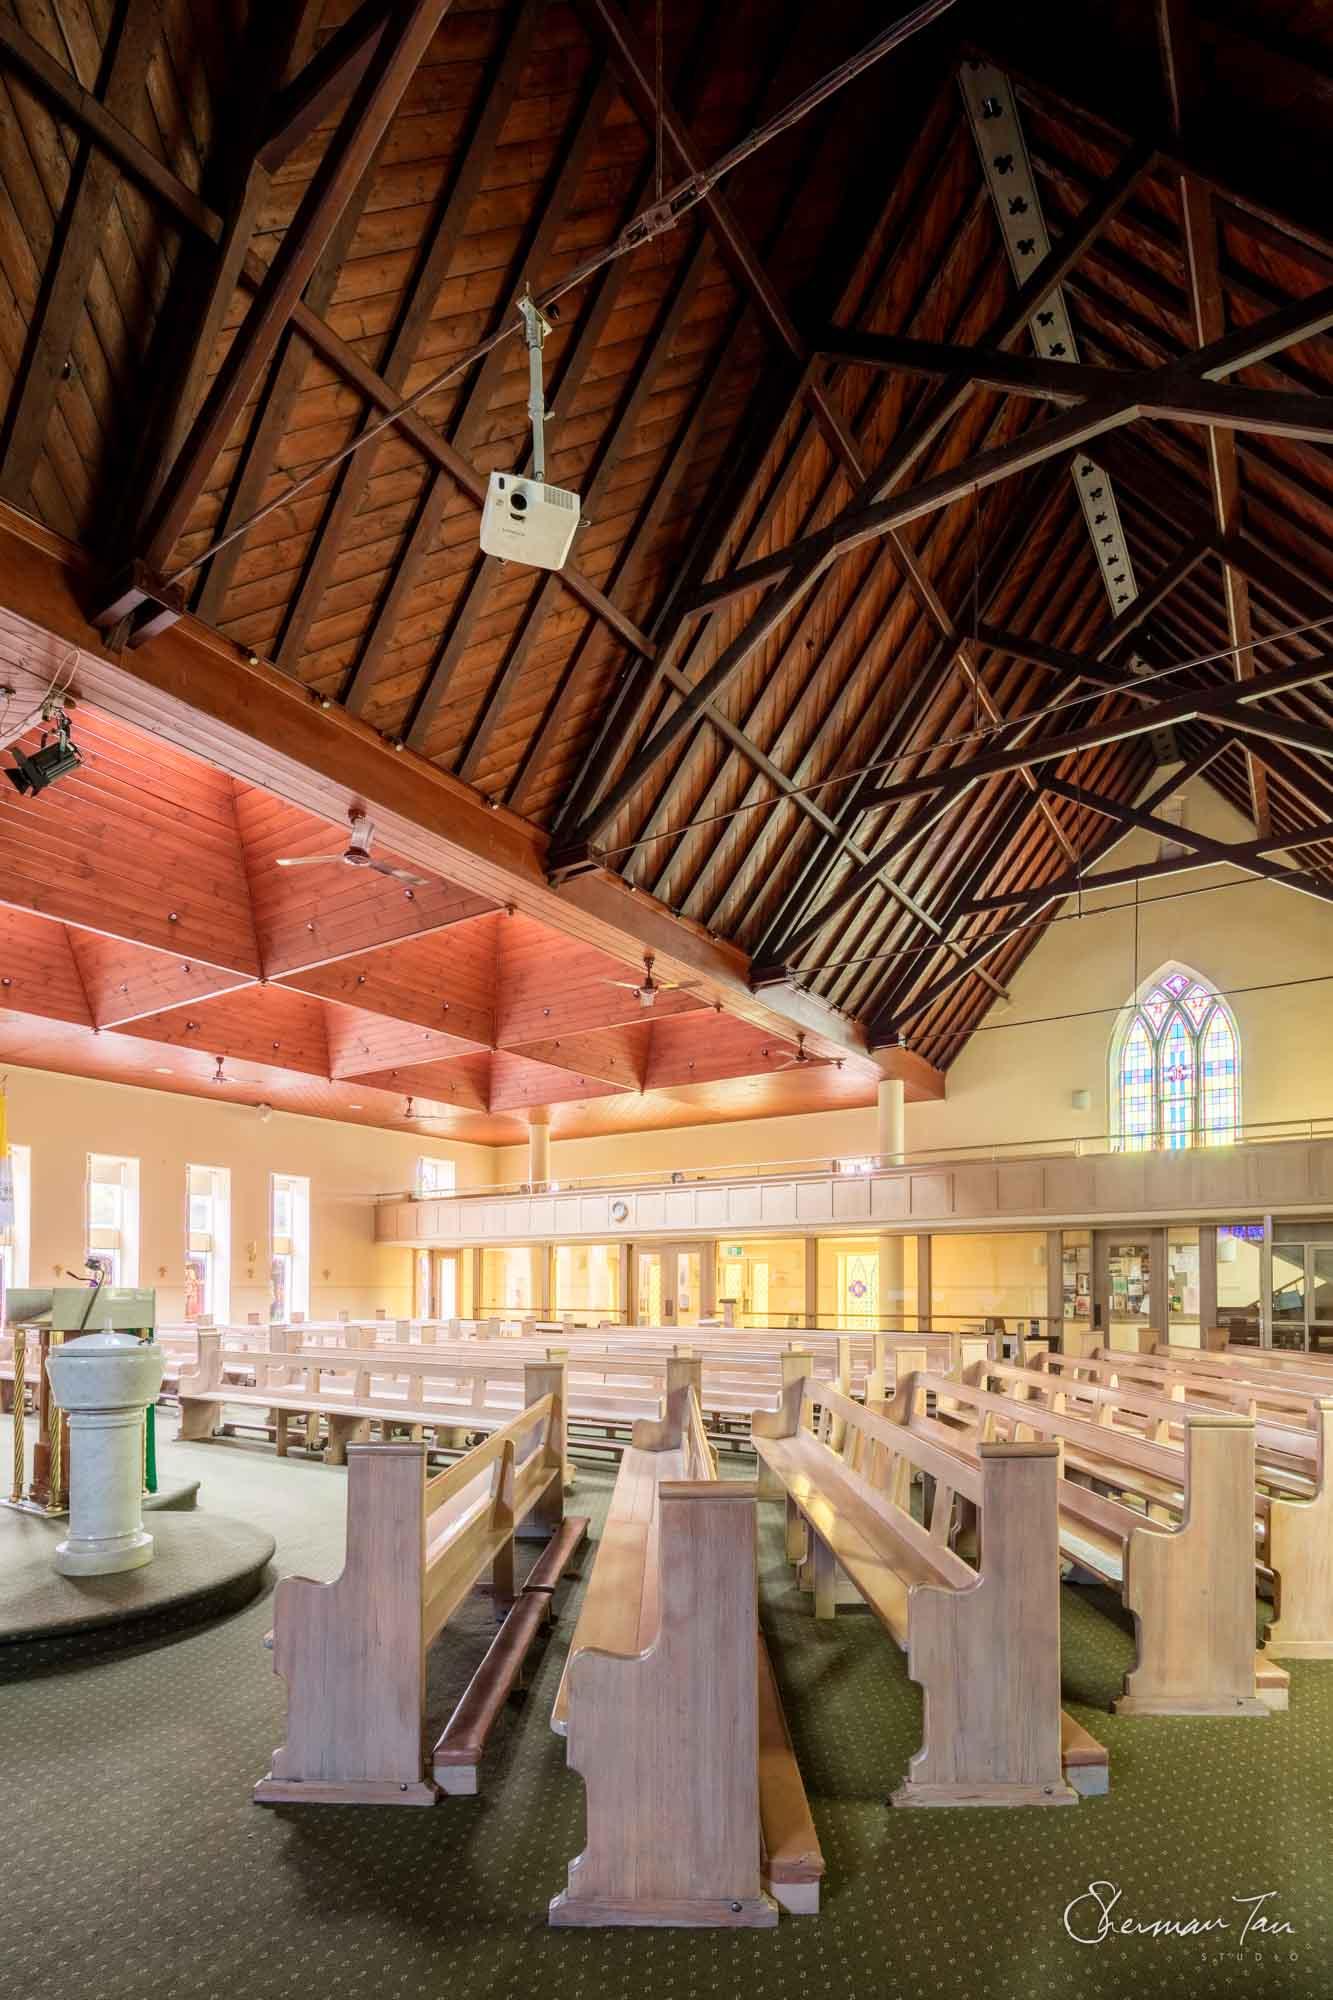 ©Sherman Tan Studio_Best Melbourne Wedding Church Venue_St Finbar-056-HDR.jpg